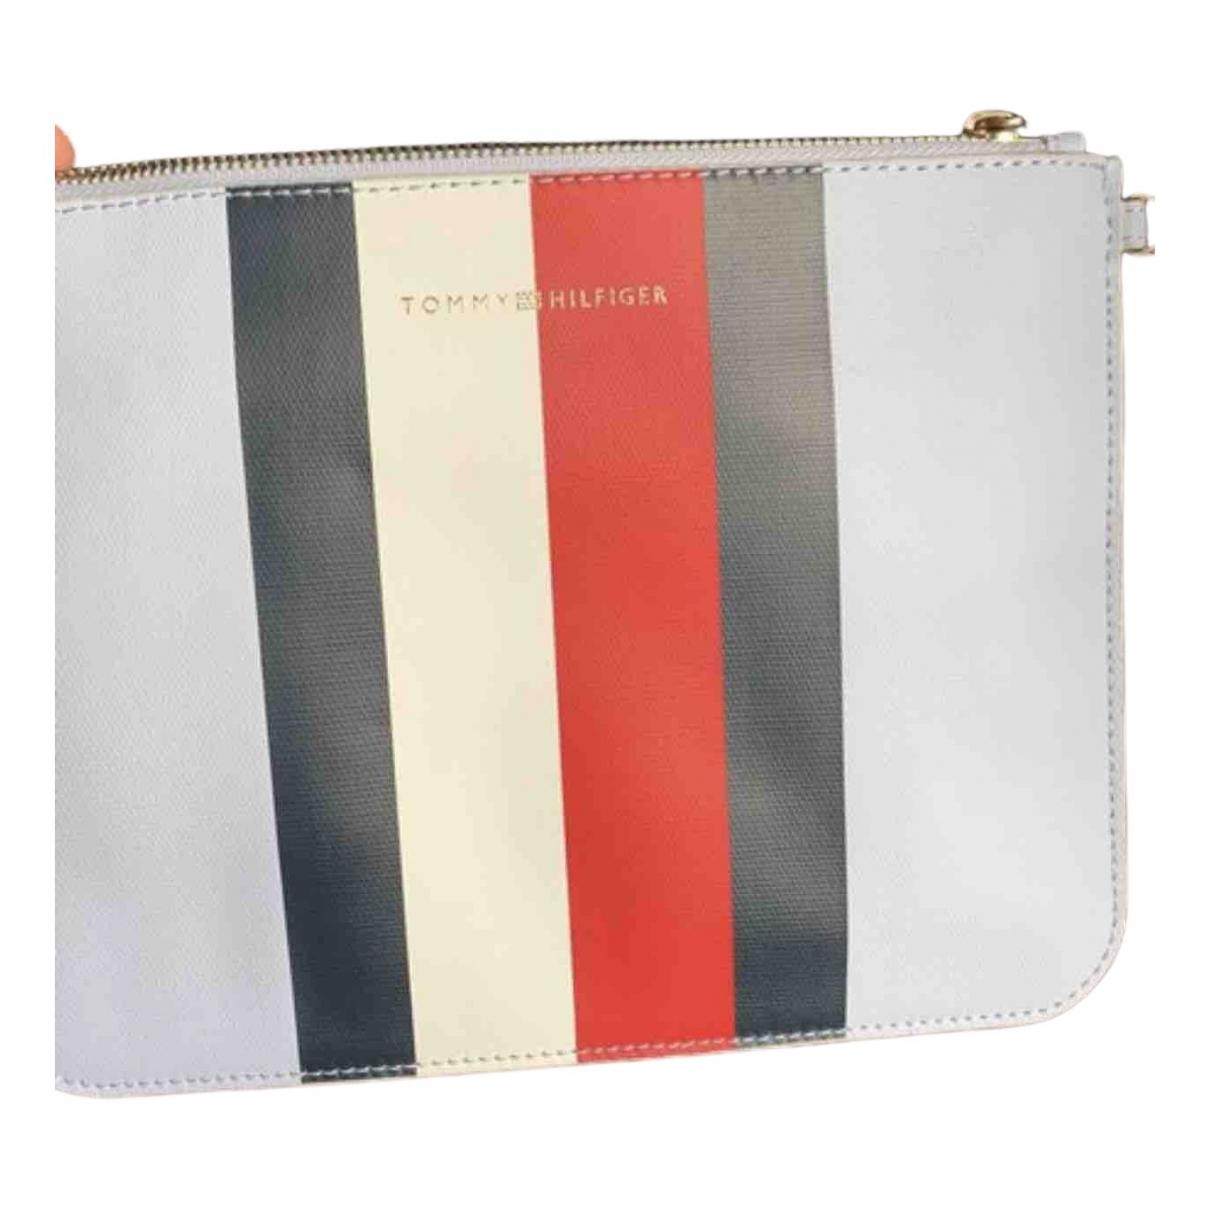 Tommy Hilfiger \N Blue Leather Clutch bag for Women \N